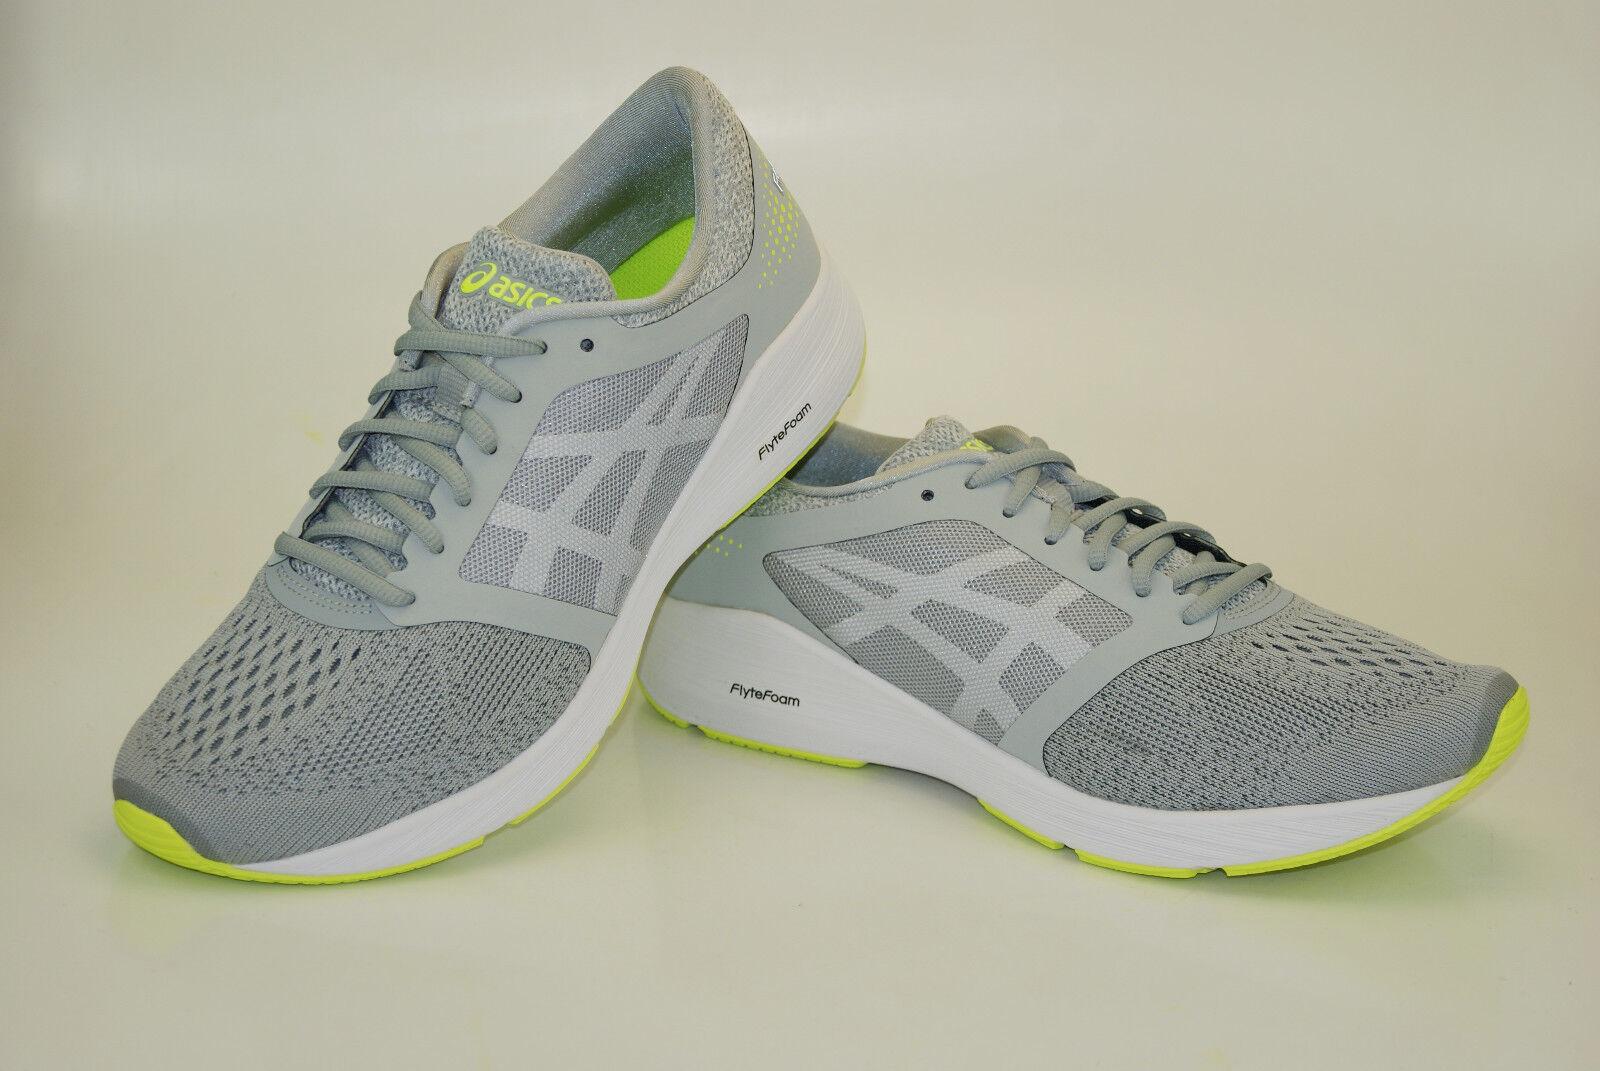 Asics Roadhawk Ff Running shoes Joggingschuhe Trainers Men's shoes T7D2N-9601 T7D2N-9601 T7D2N-9601 925a84